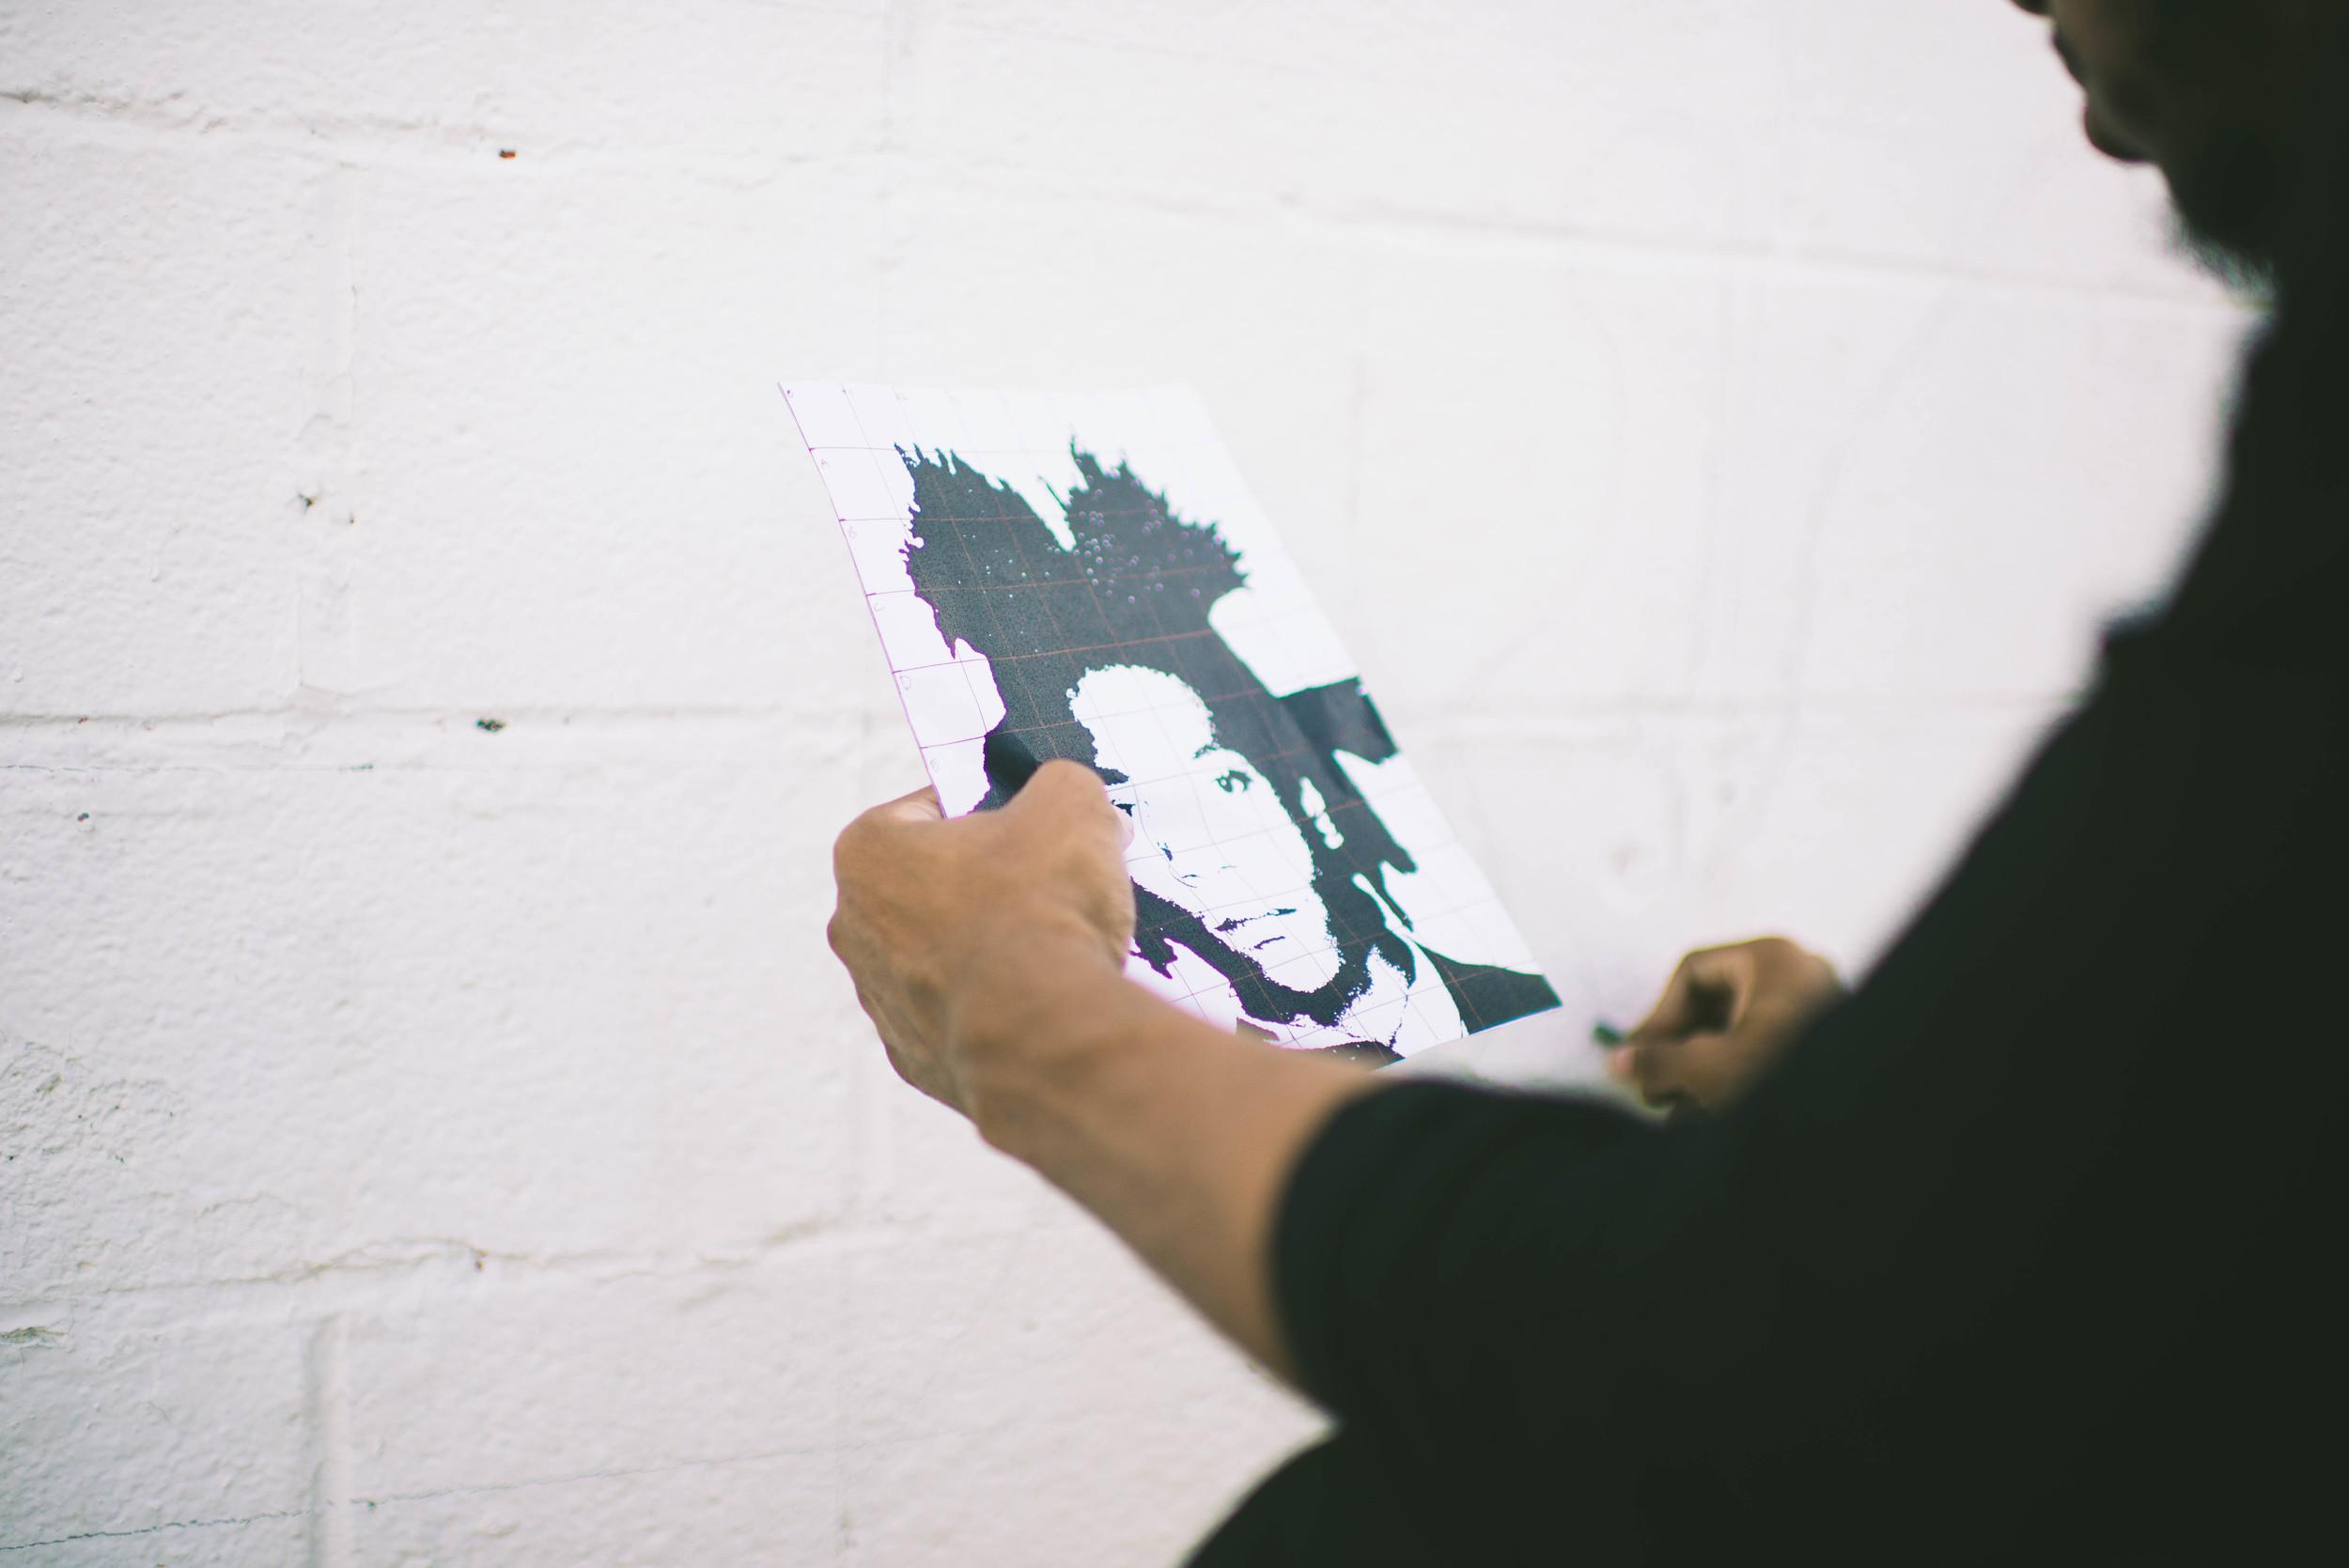 basquiat-process-8.jpg